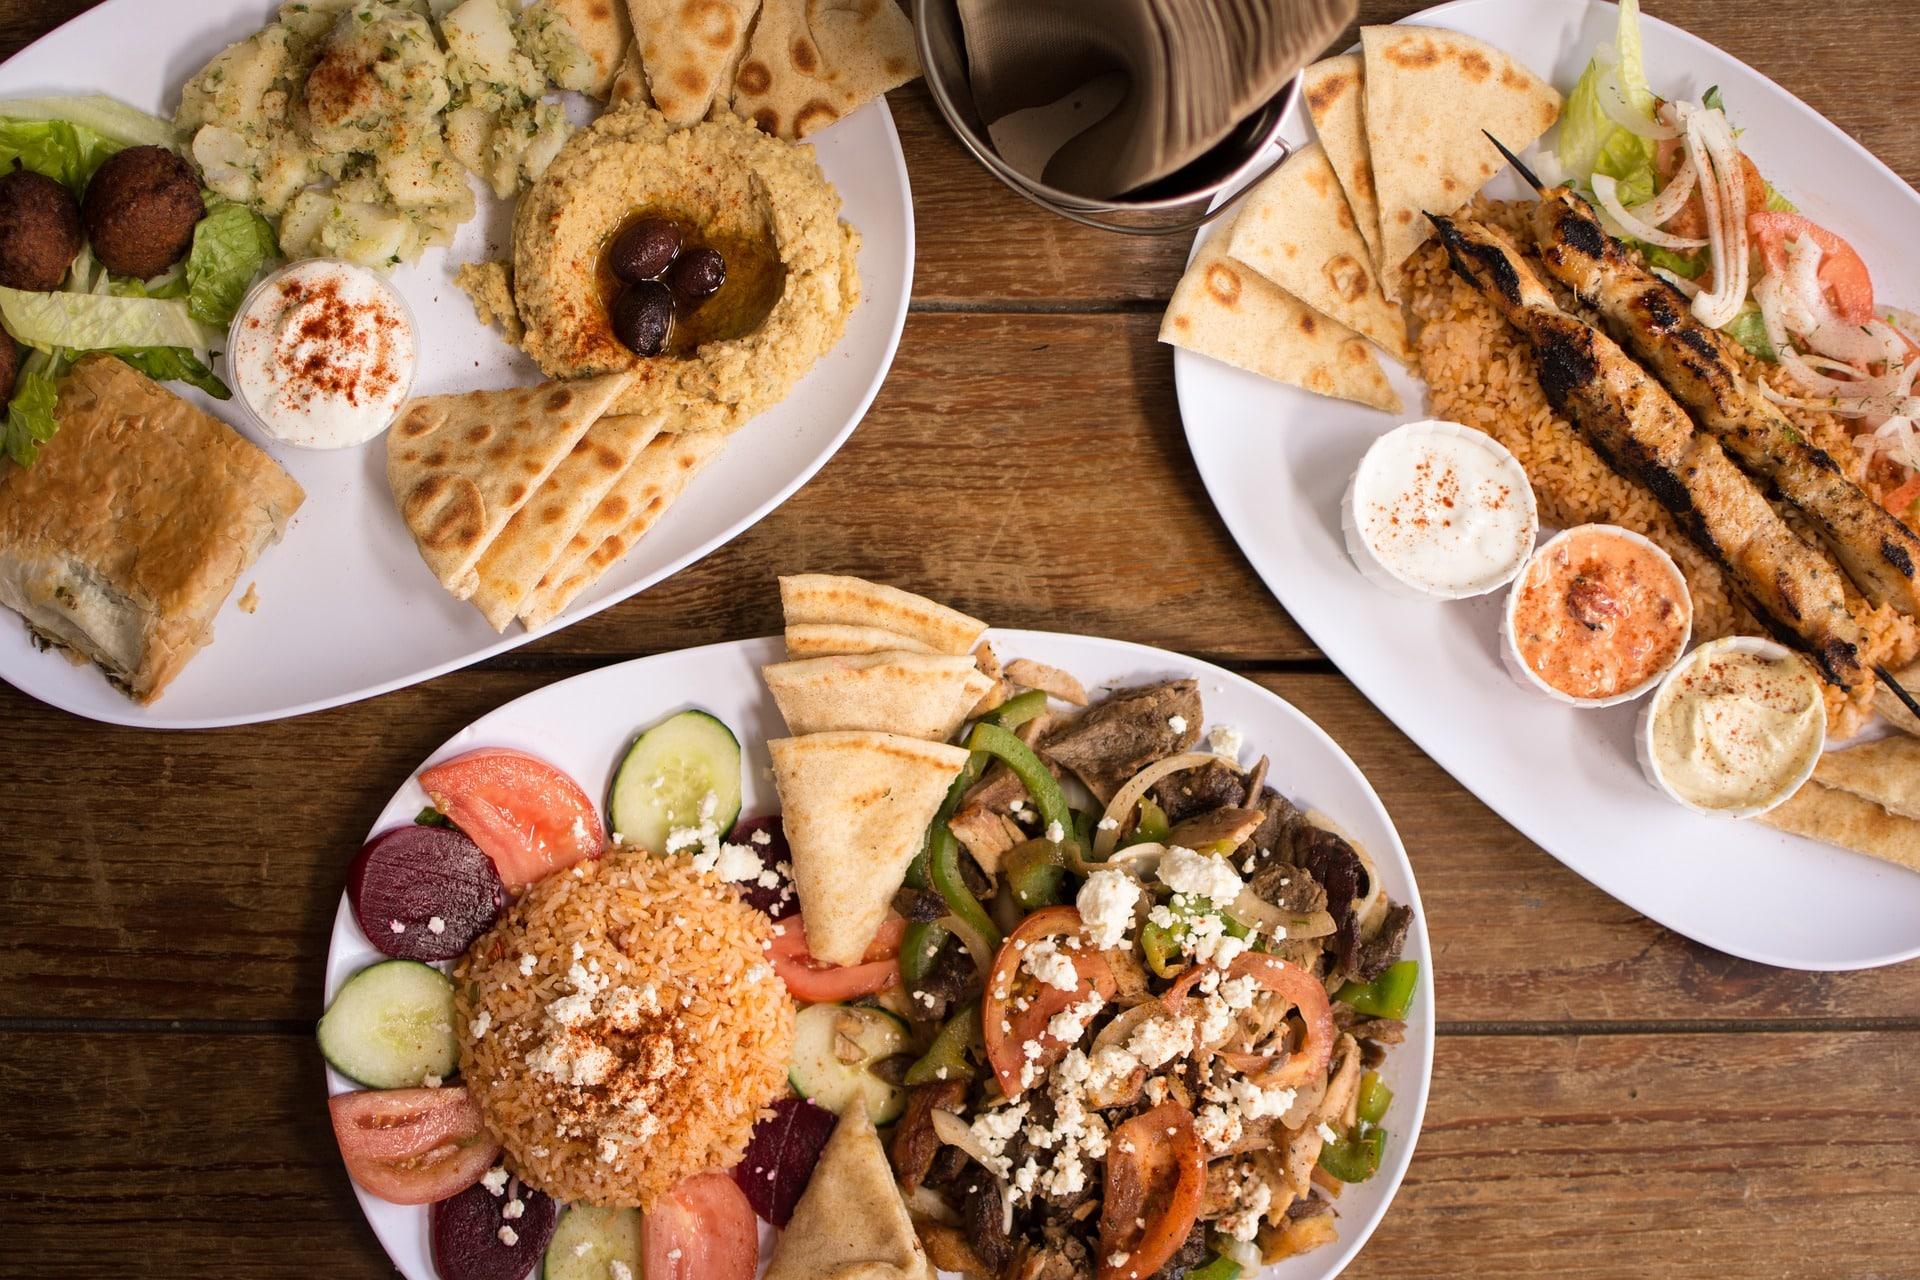 Kuchnie świata - kuchnia grecka